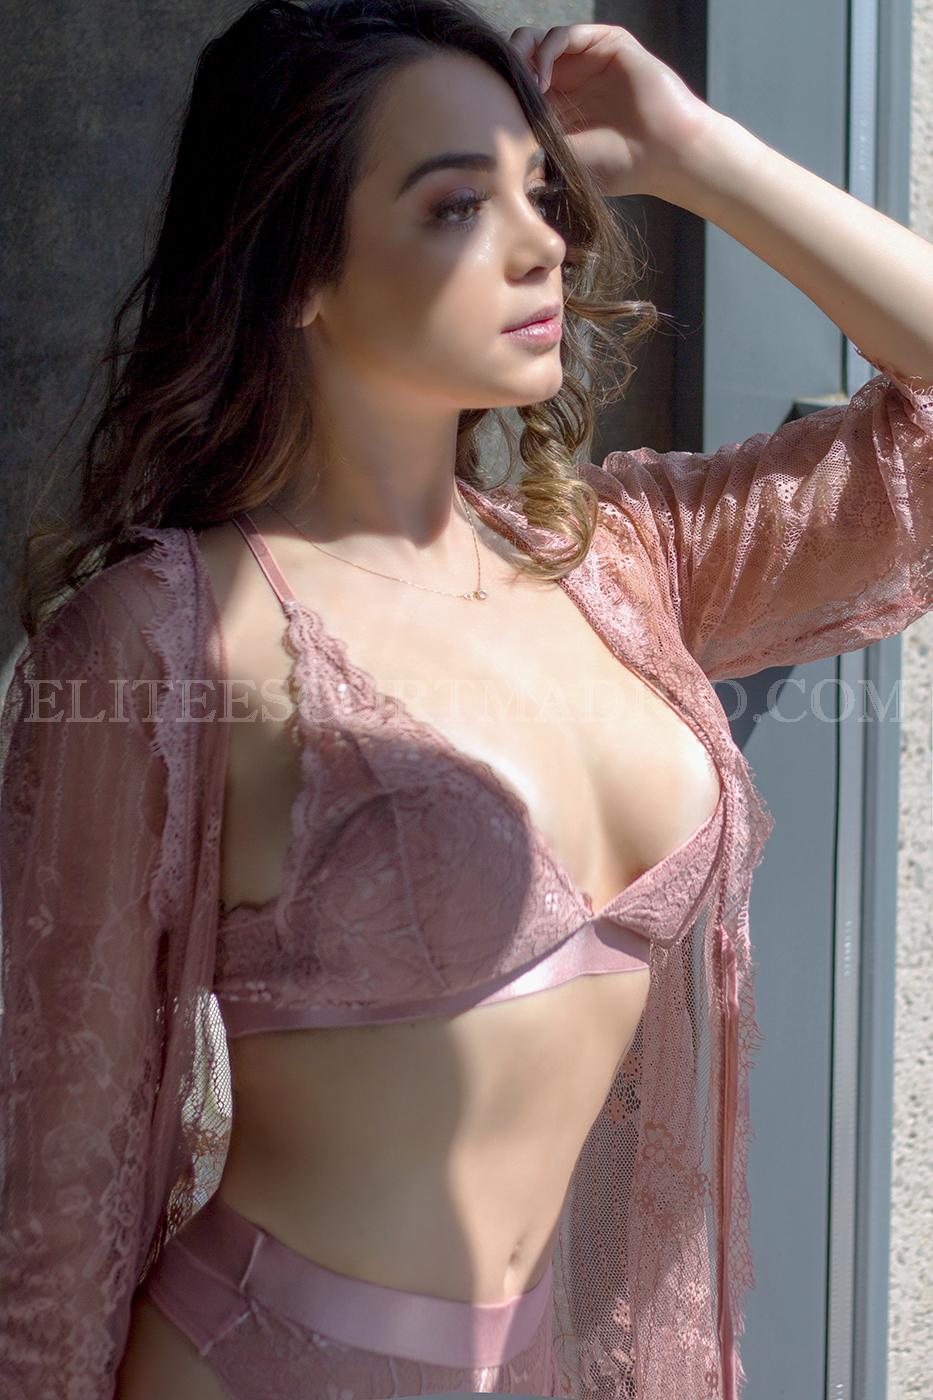 Melline, bella escort brasilera en Madrid